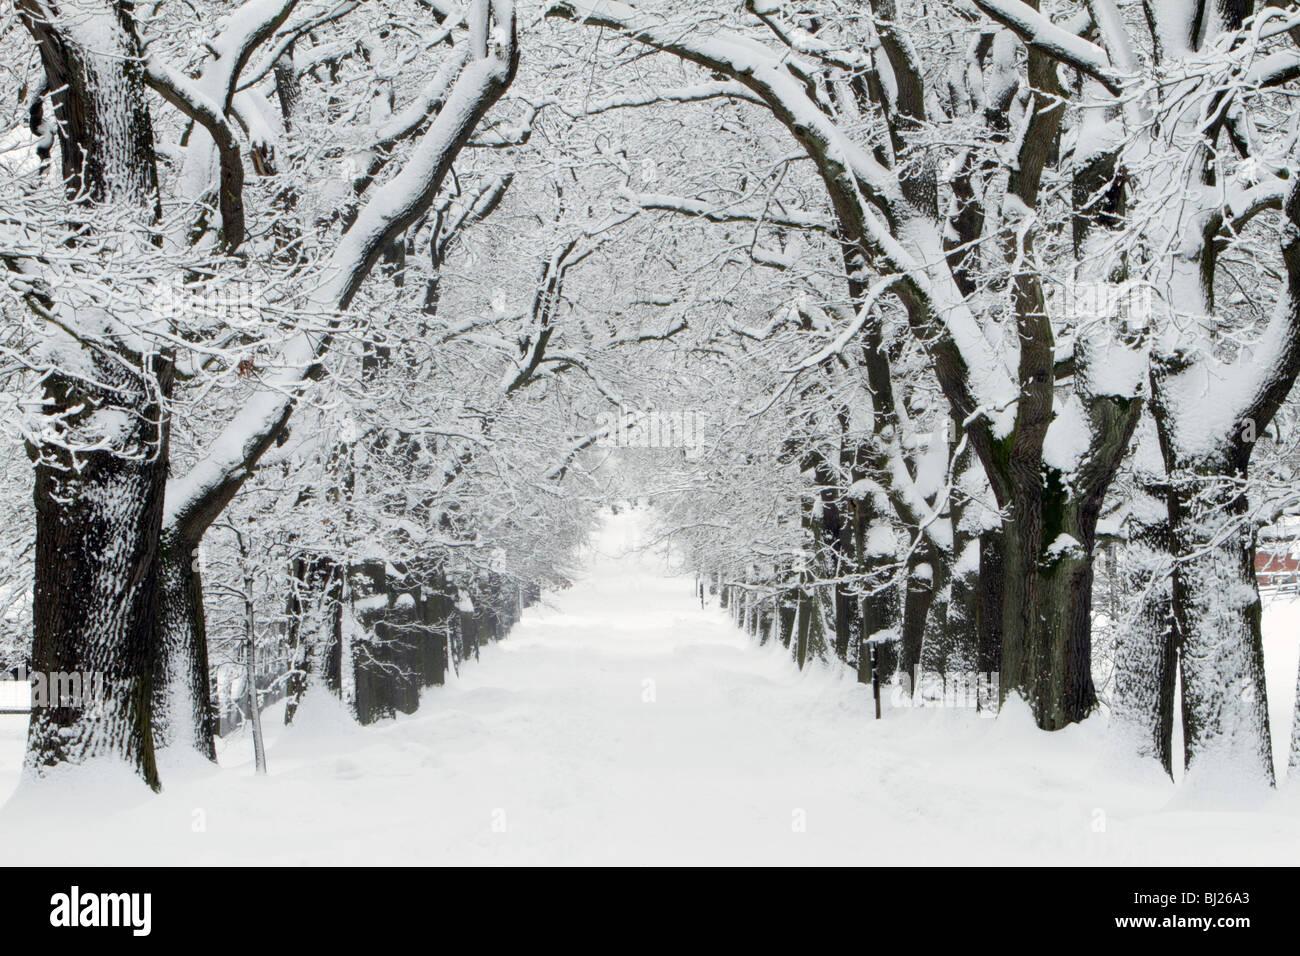 Oak trees, Quercus robur, Avenue in winter, Sababurg, North Hessen, Germany - Stock Image